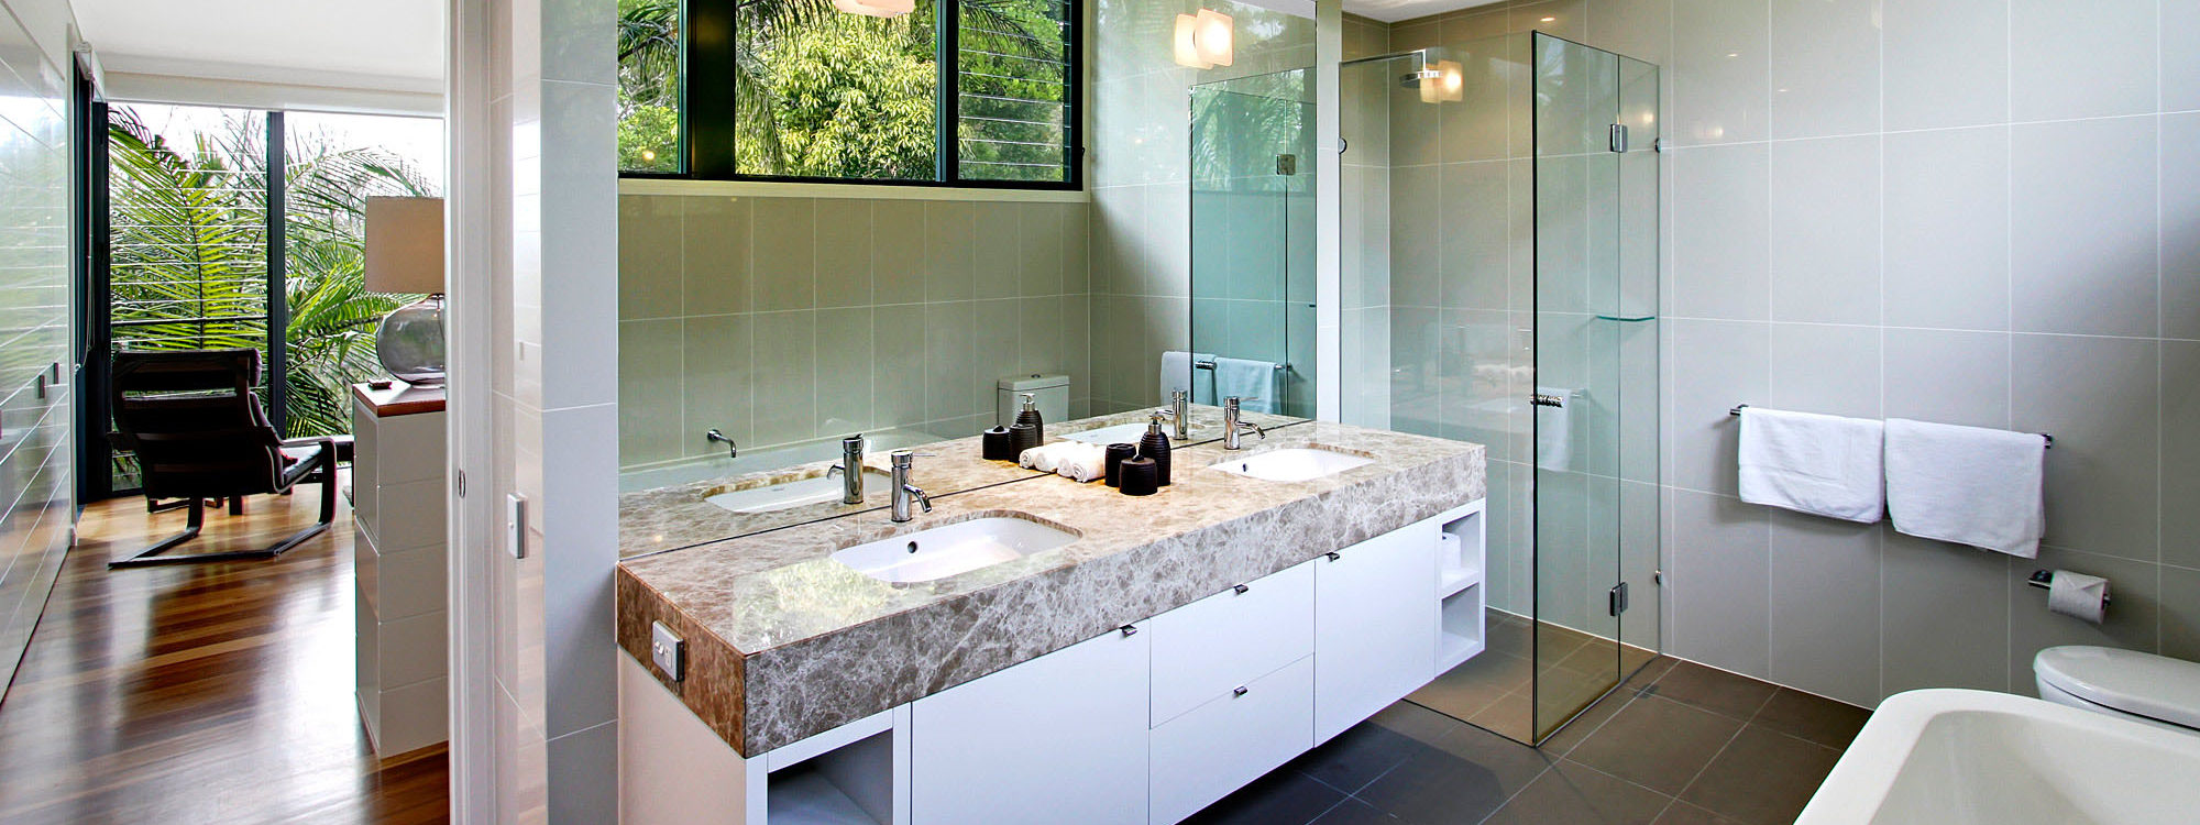 Ocean View at Kiah - Byron Bay - Bathroom Master